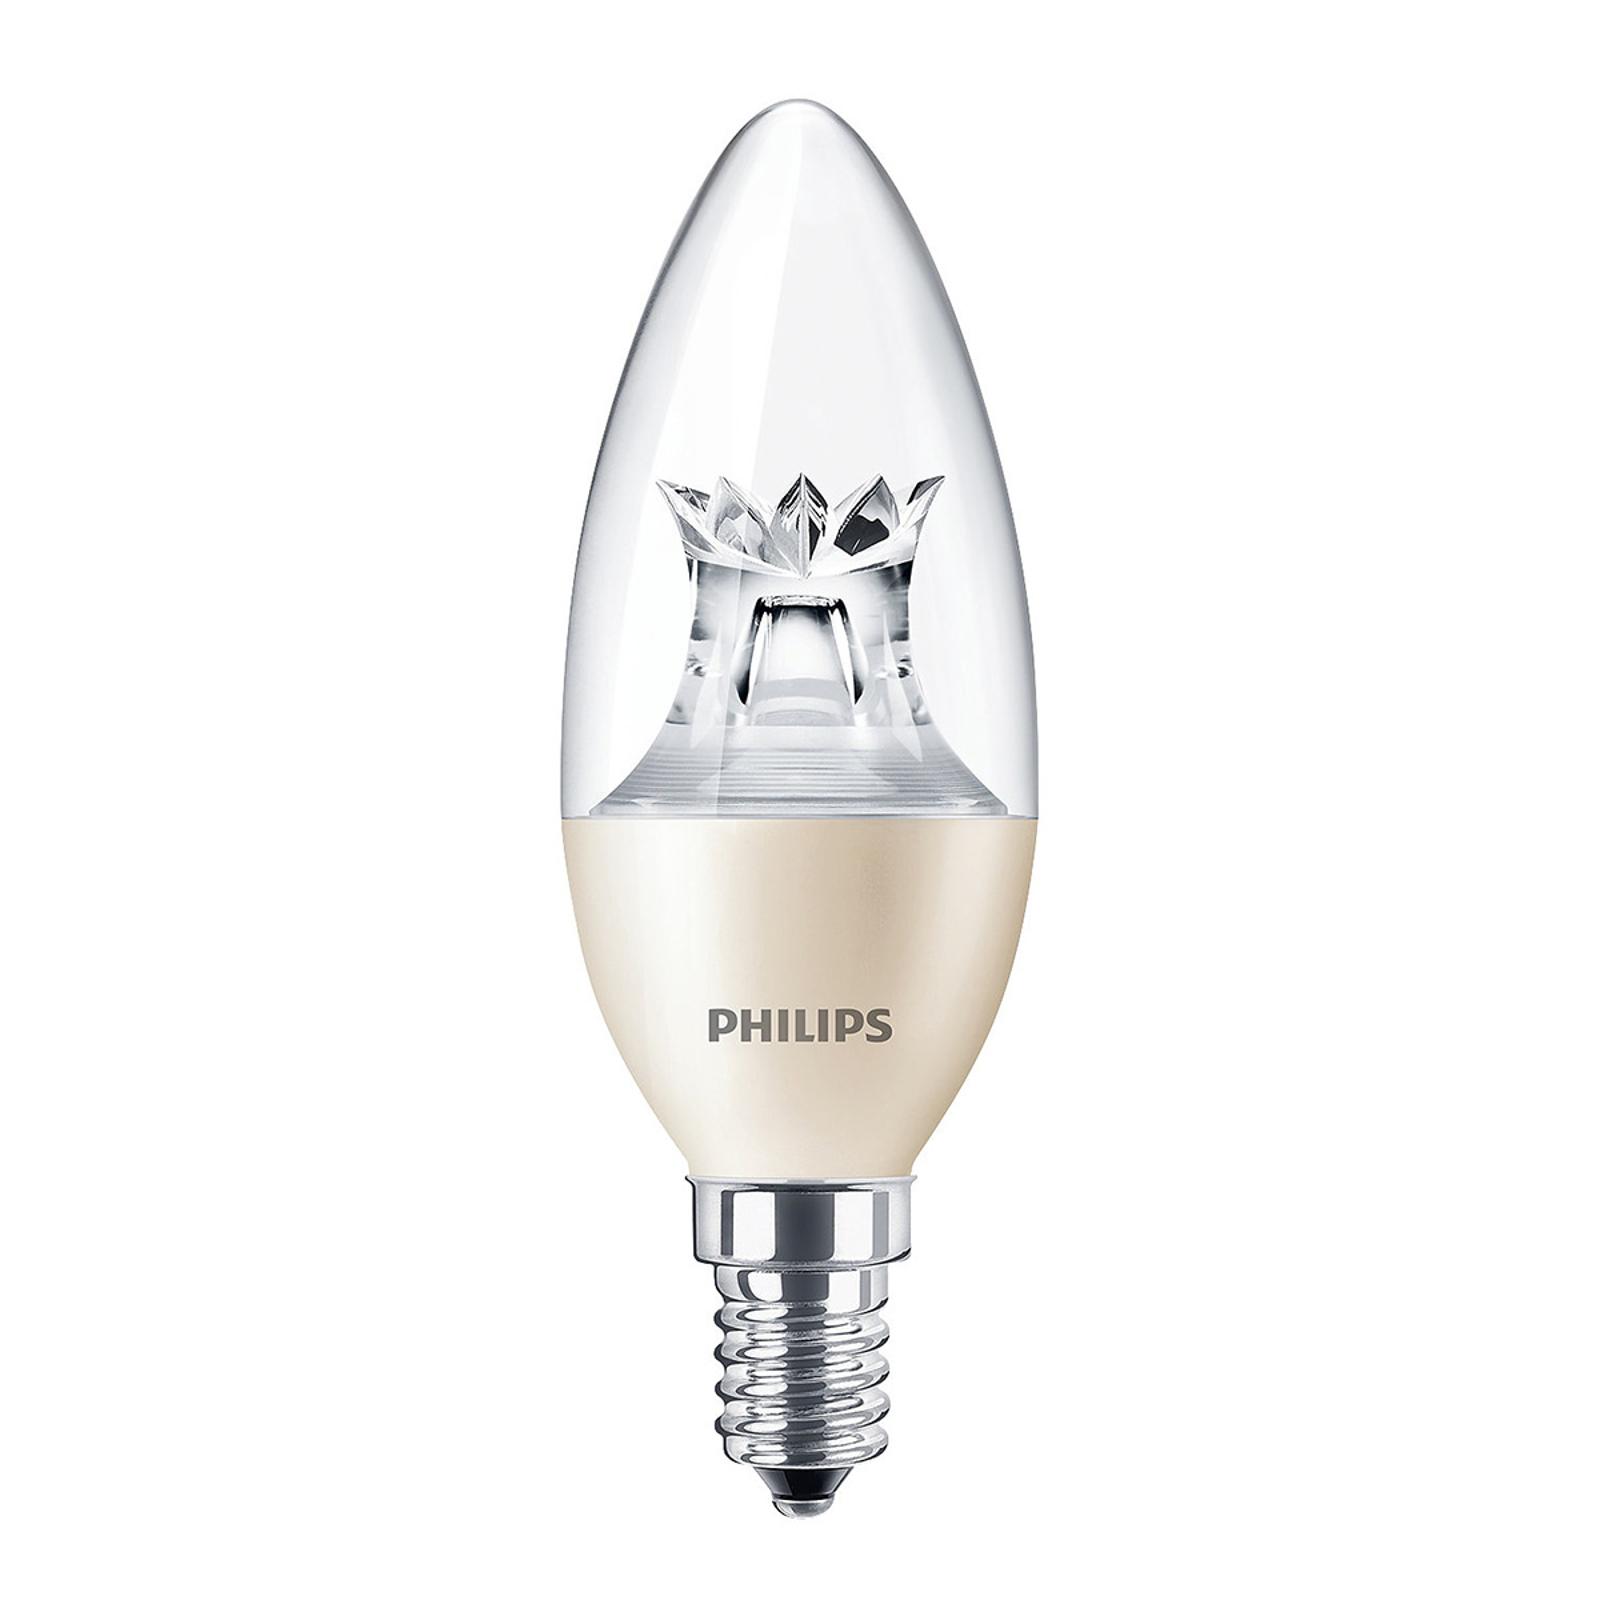 LED-kynttilälamppu E14 8W B40 Candle DT CL DimTone